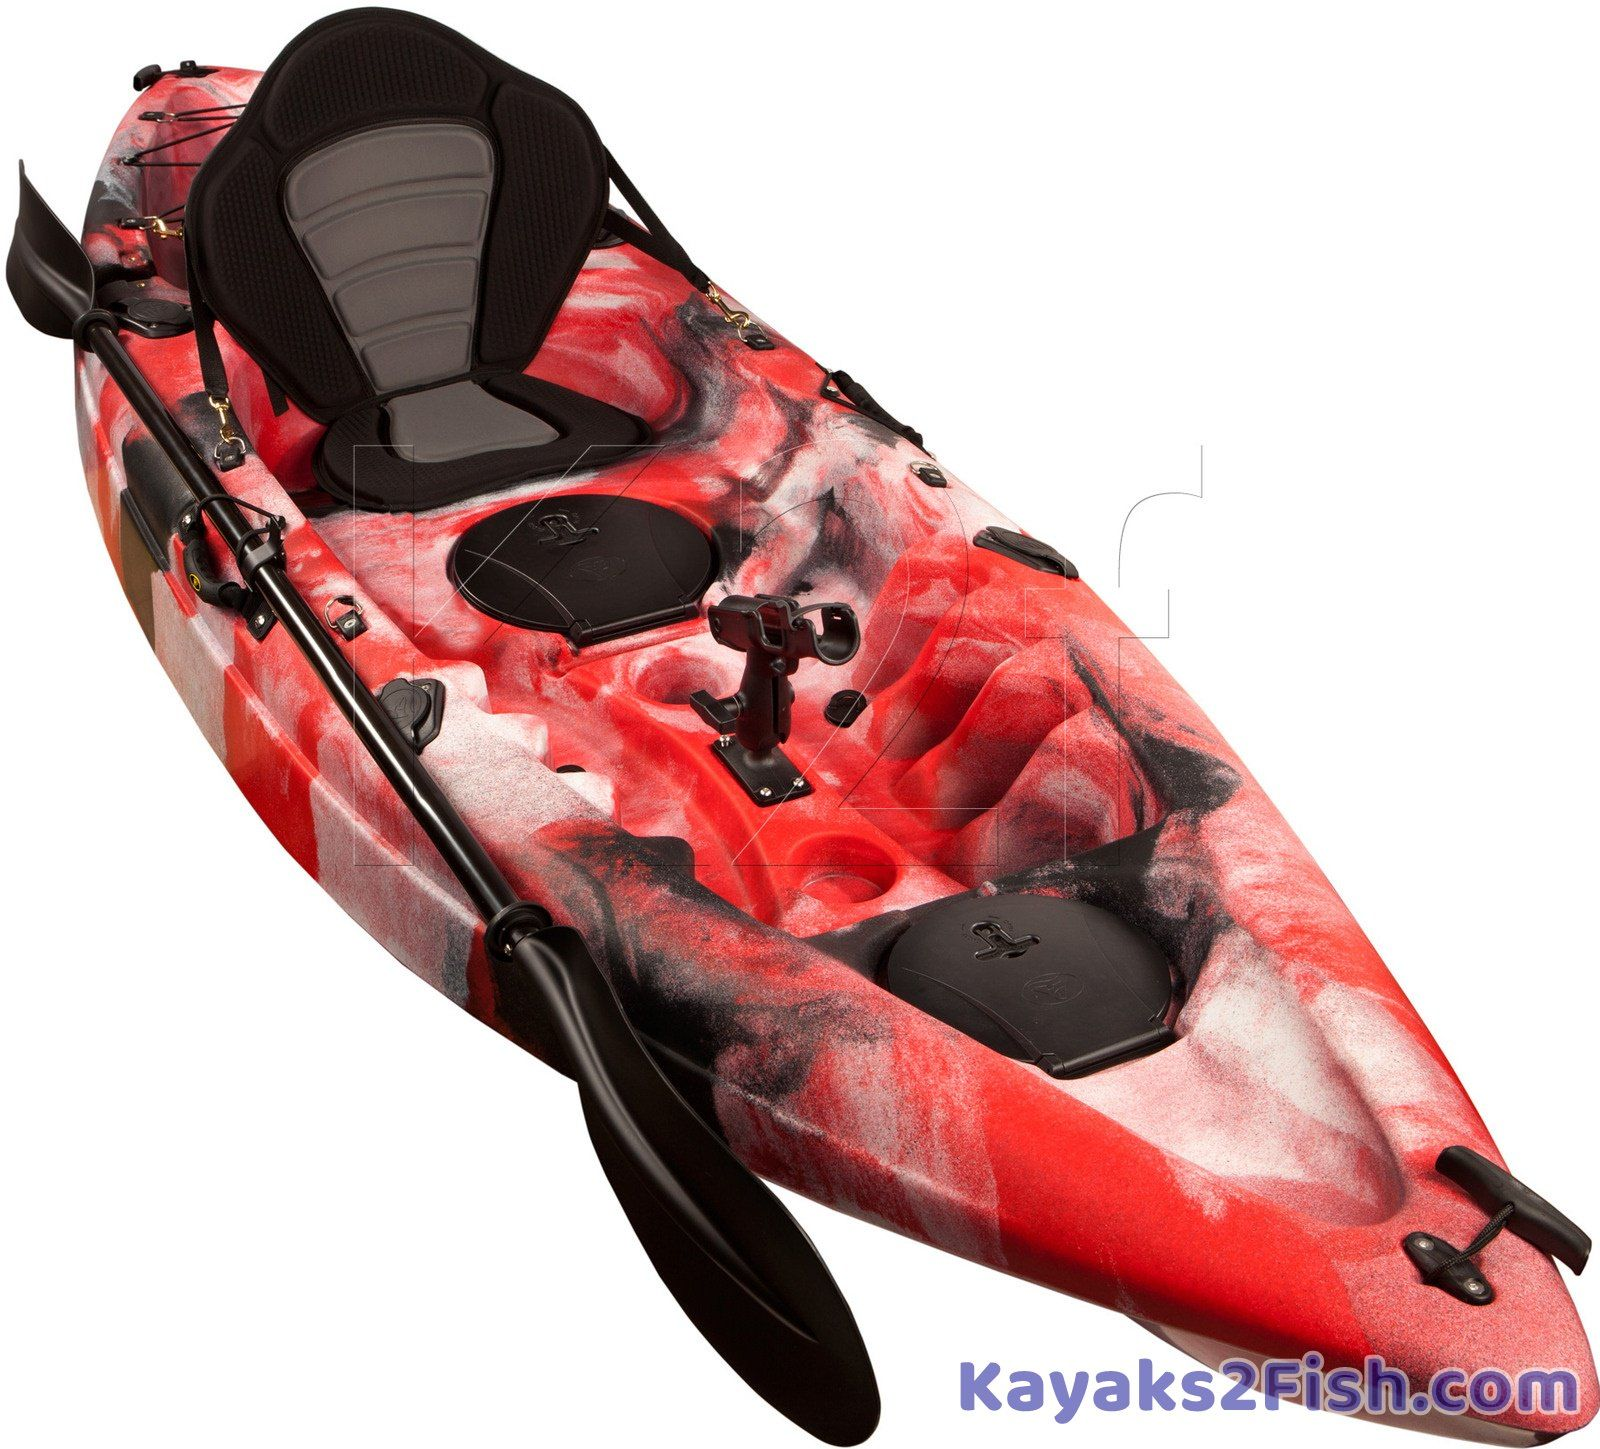 fishing kayak kayak for sale sea kayak kayak fishing inflatable